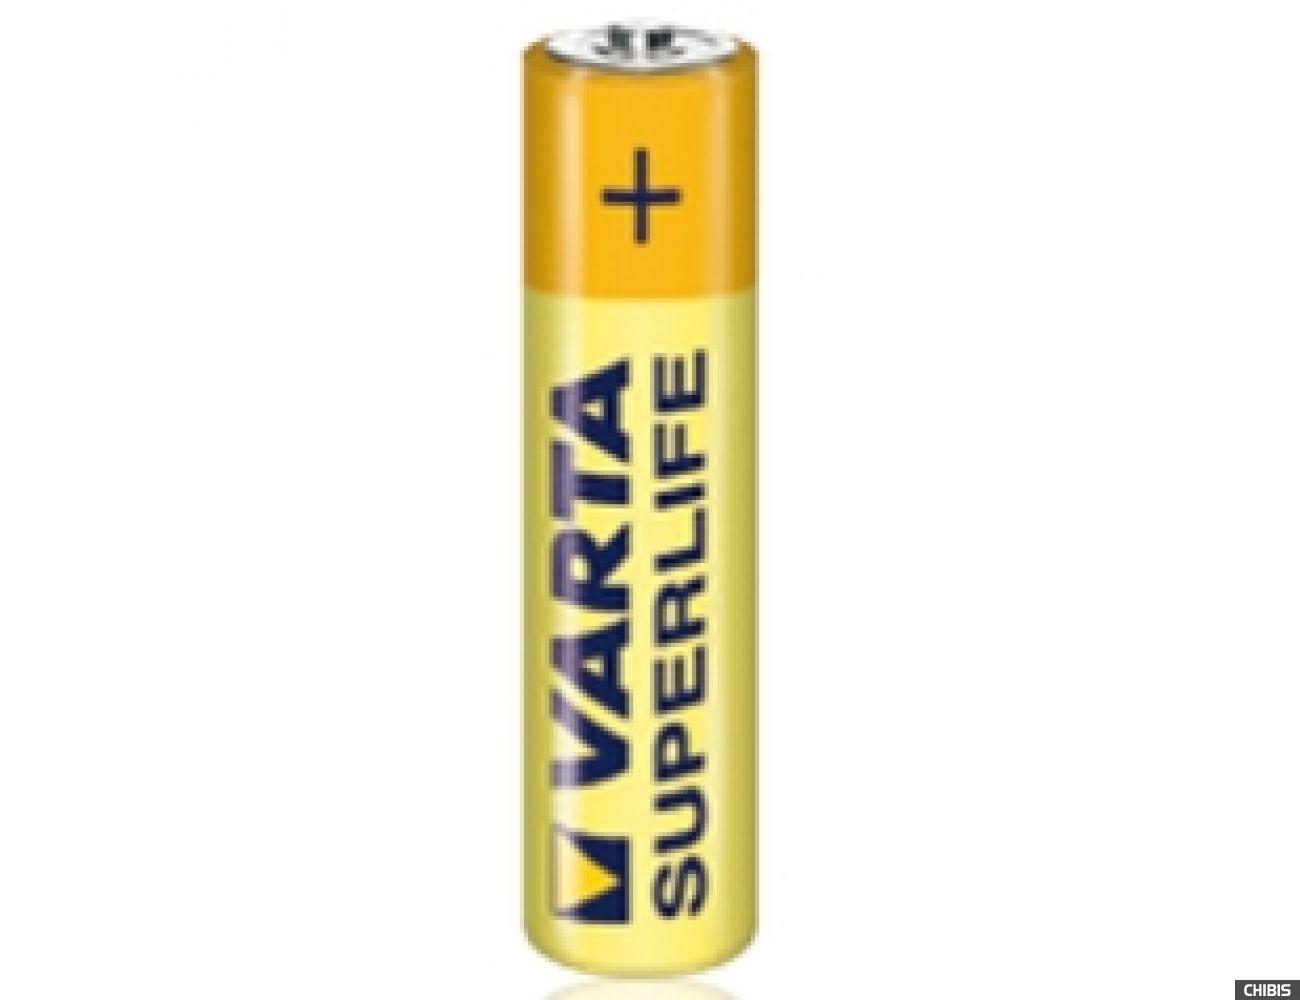 Батарейка Varta AAA Superlife (LR03, 1.5V, Цинково-угольная)